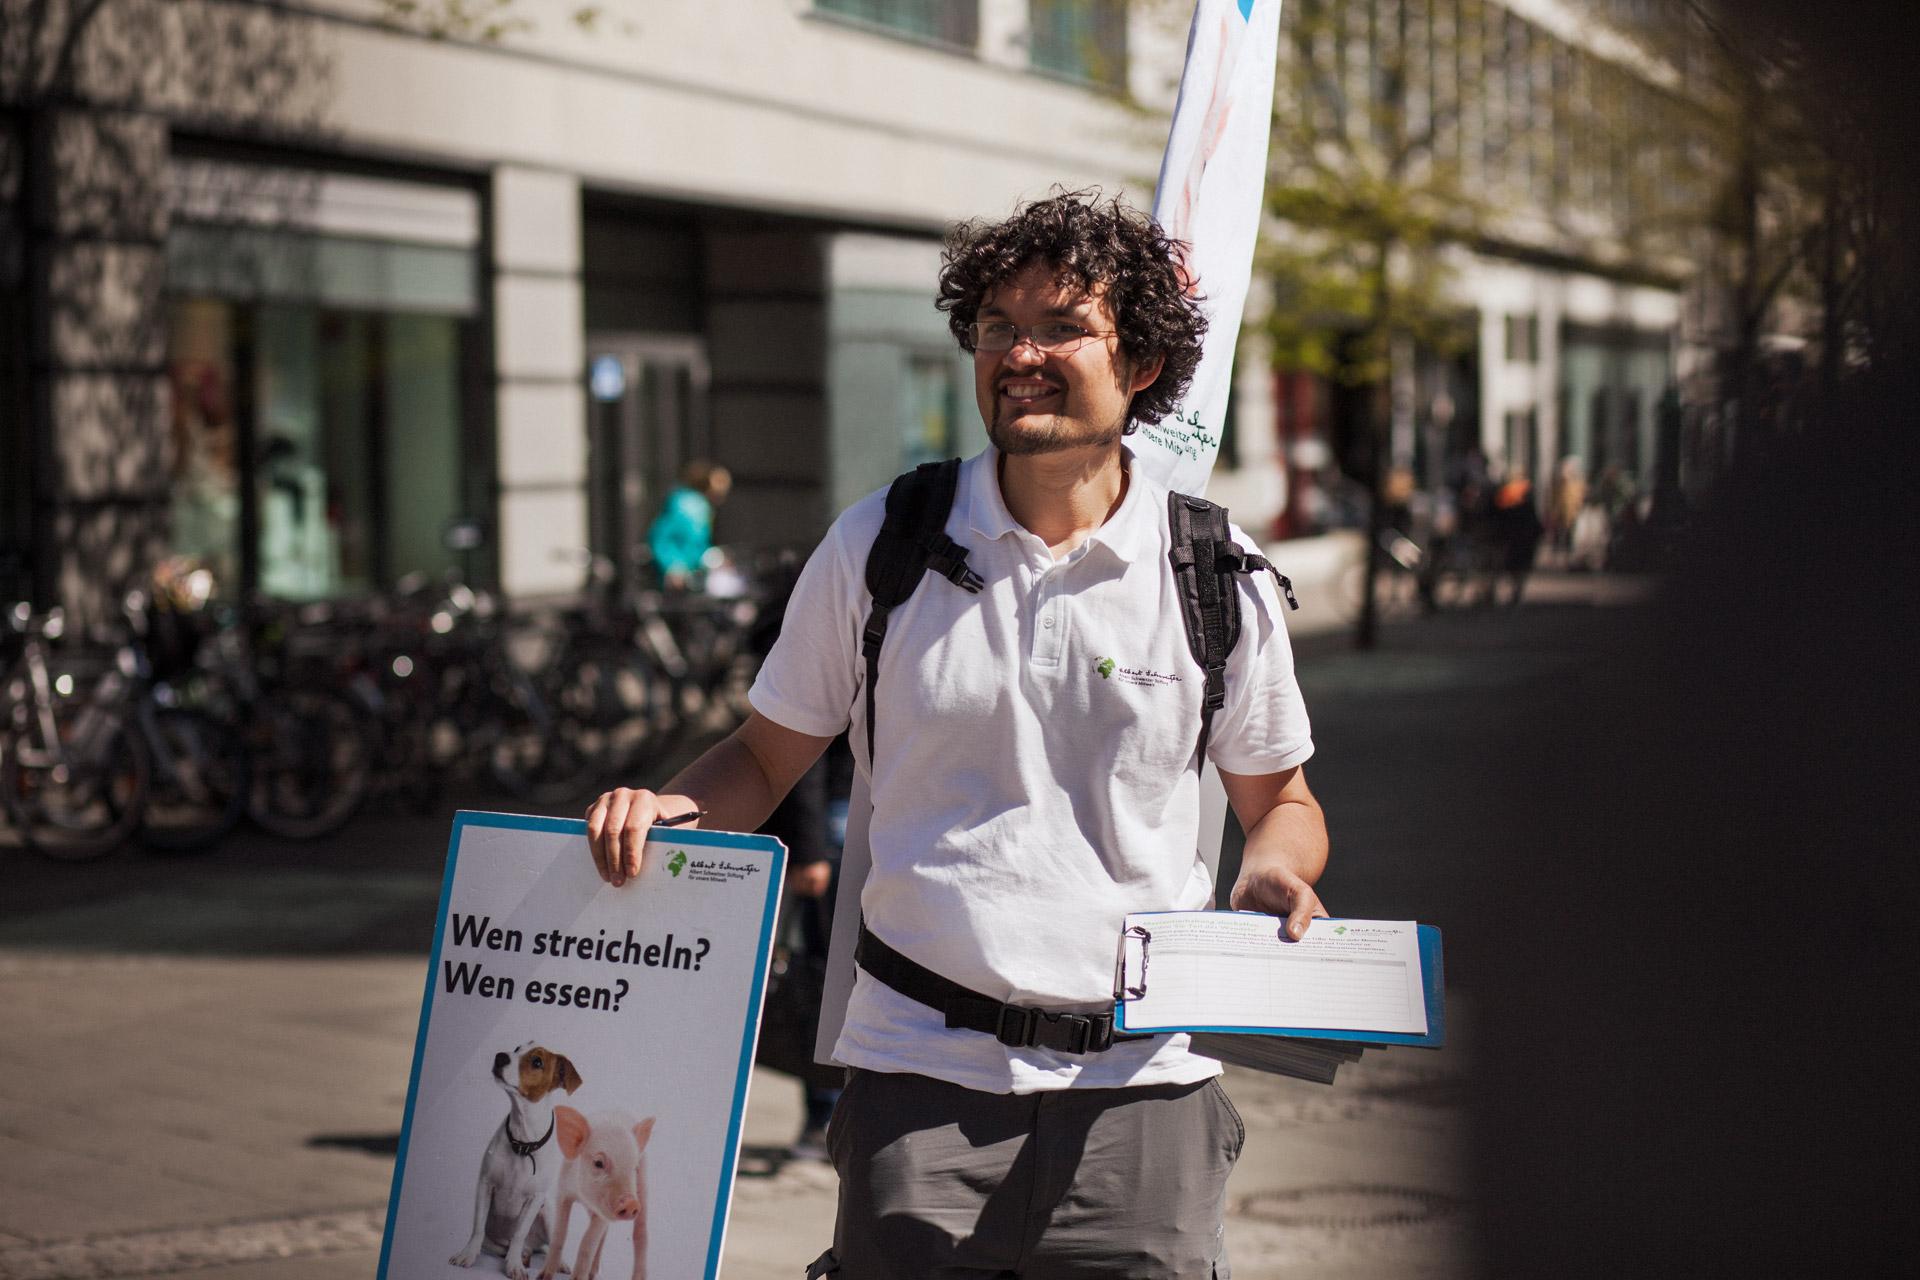 timo-stammberger-photography-fotografie-animal-rights-tierrechte-activism-aktivismus-mitgefuehl-vegan-compassion